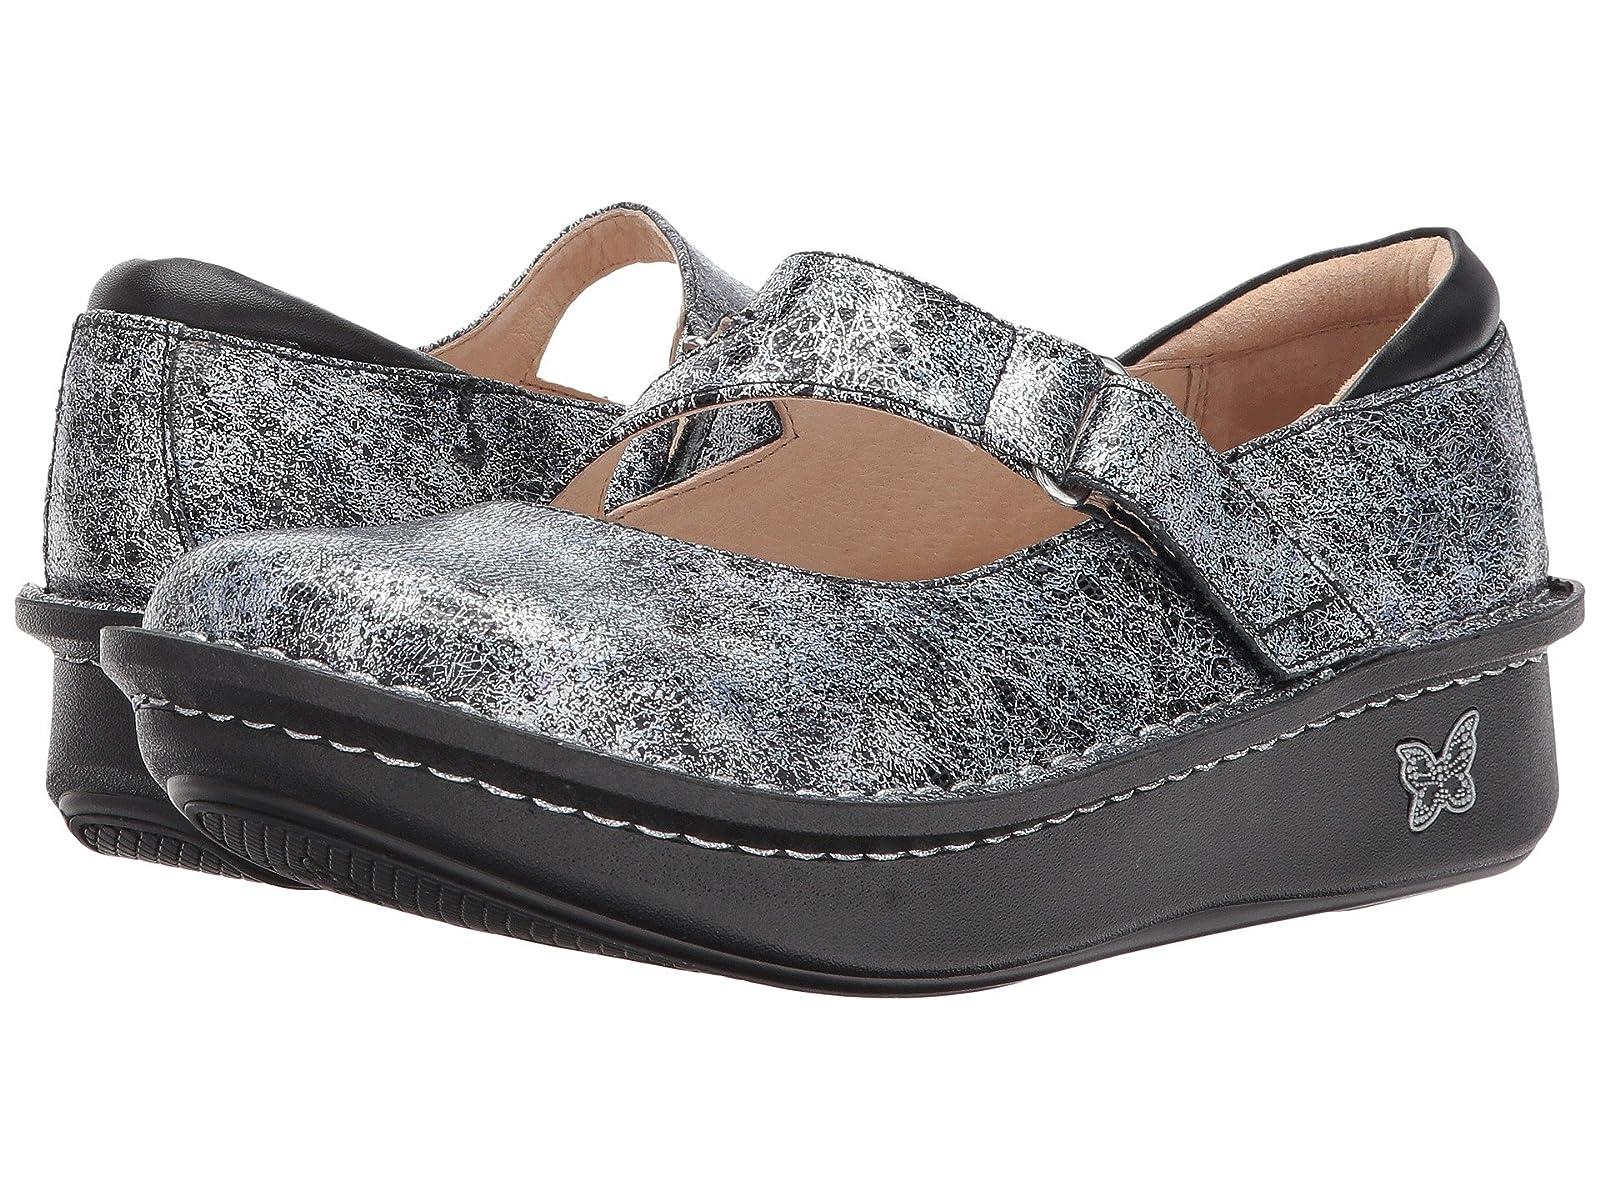 Alegria DaynaCheap and distinctive eye-catching shoes